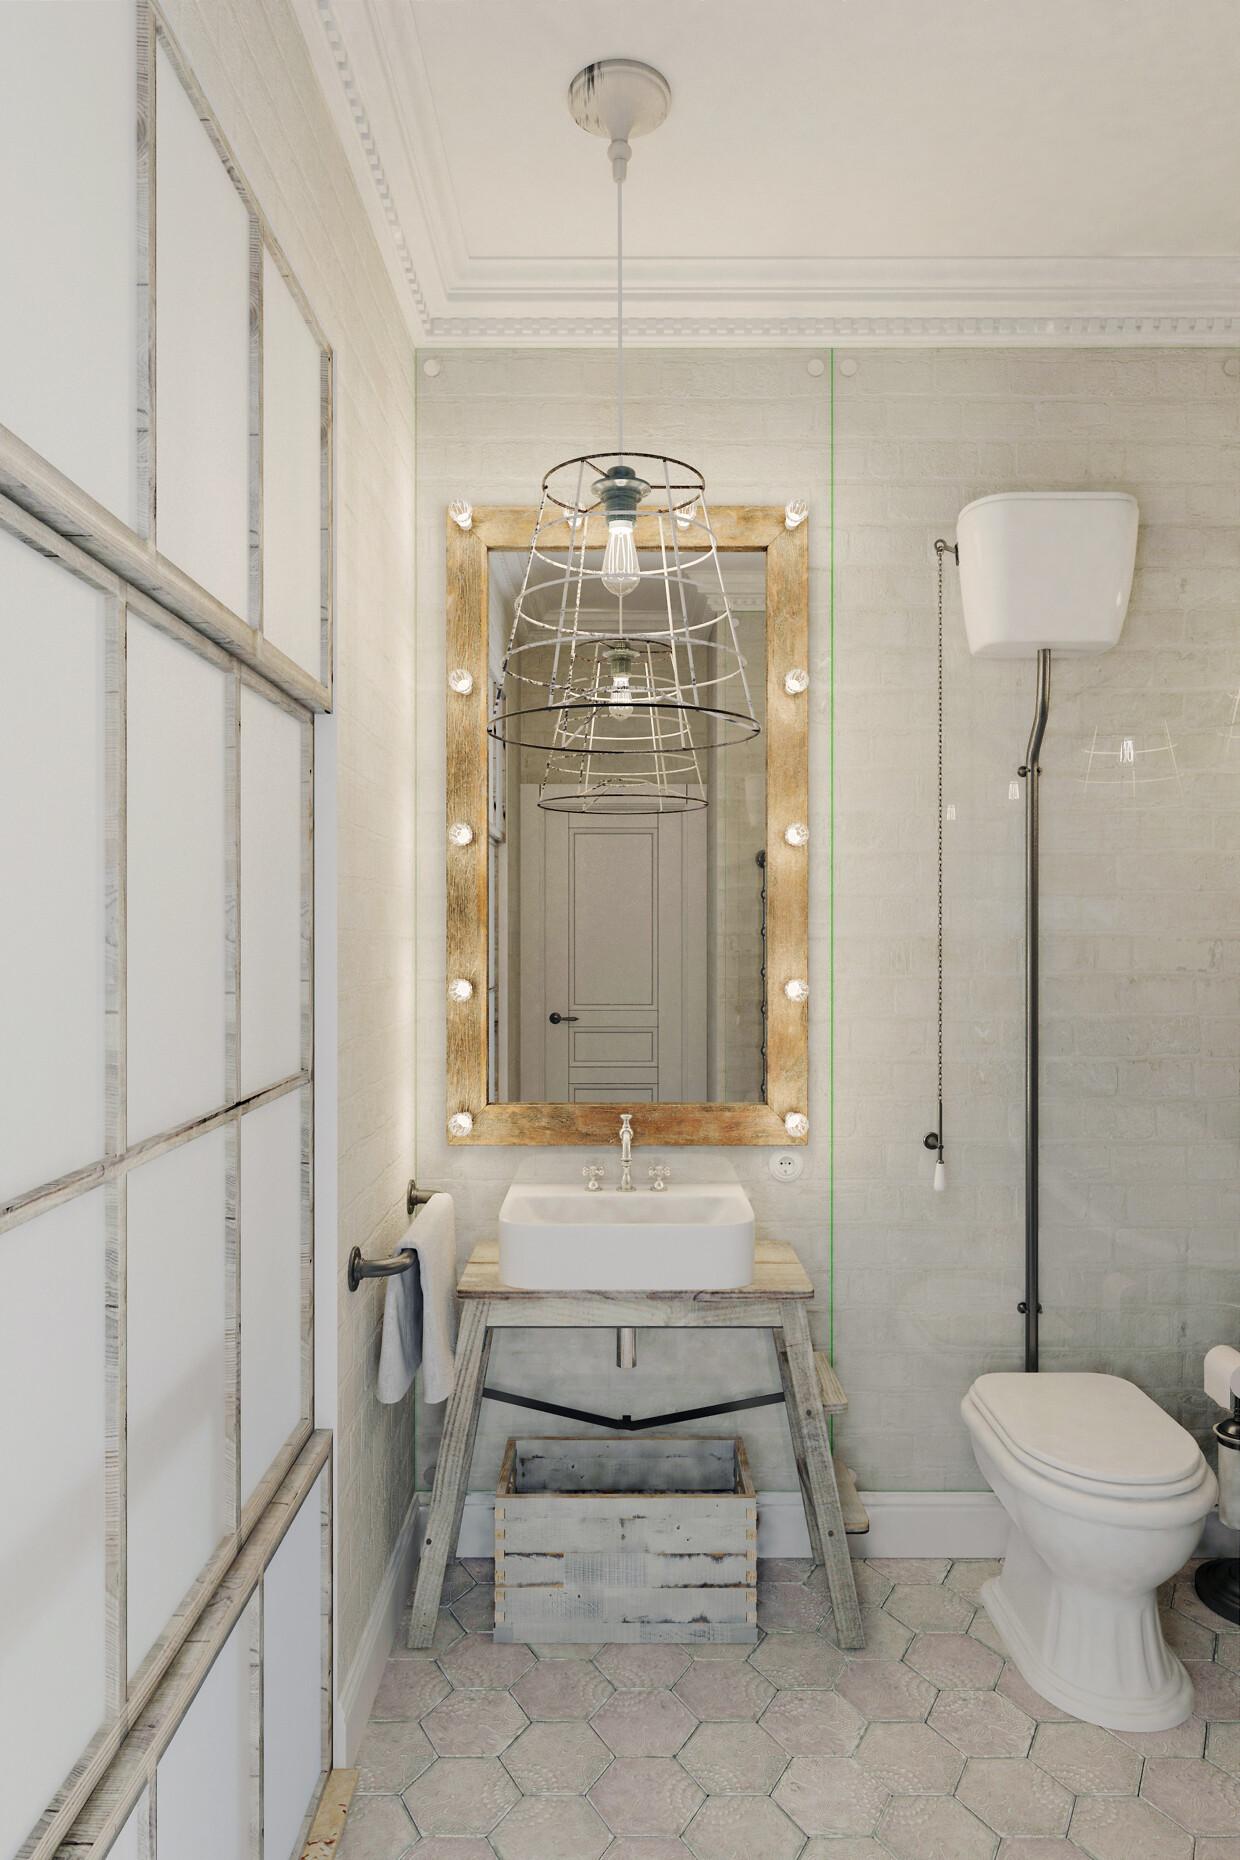 Apartment Prague with a completely white interior - Anton Medvedev - HomeWorldDesign (12)